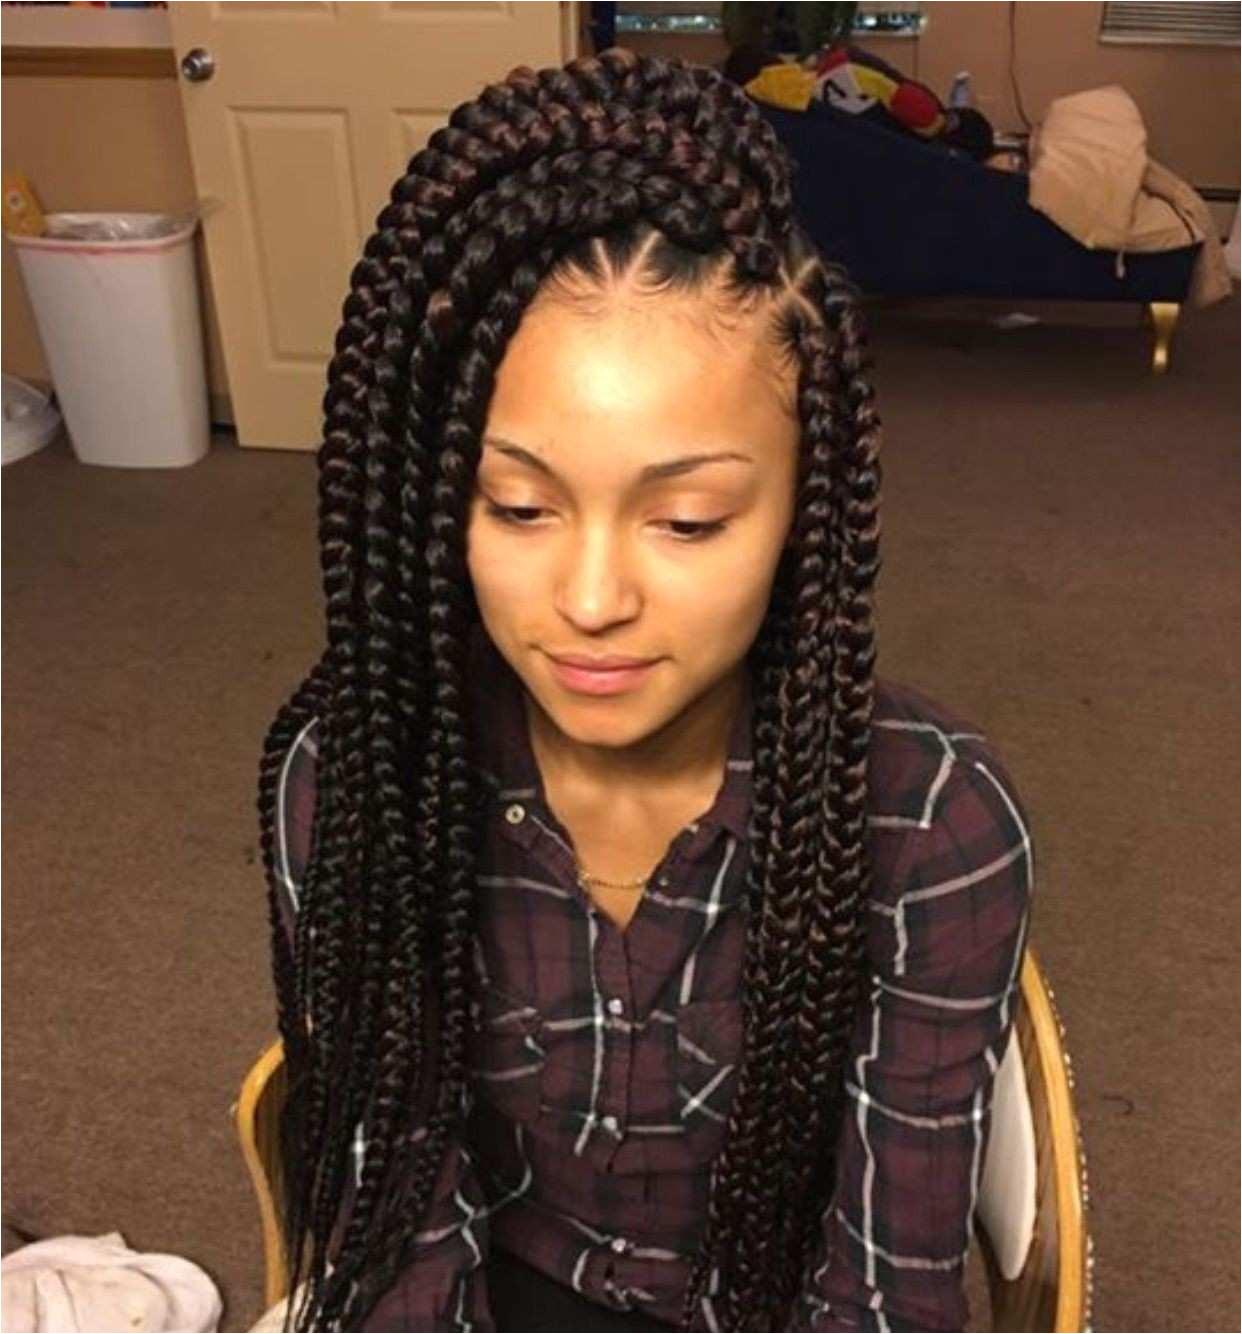 Little Black Girls Hairstyles Braids Unique Short Braids Hairstyle New Dreadlocks Braids Hairstyles New Pin Od